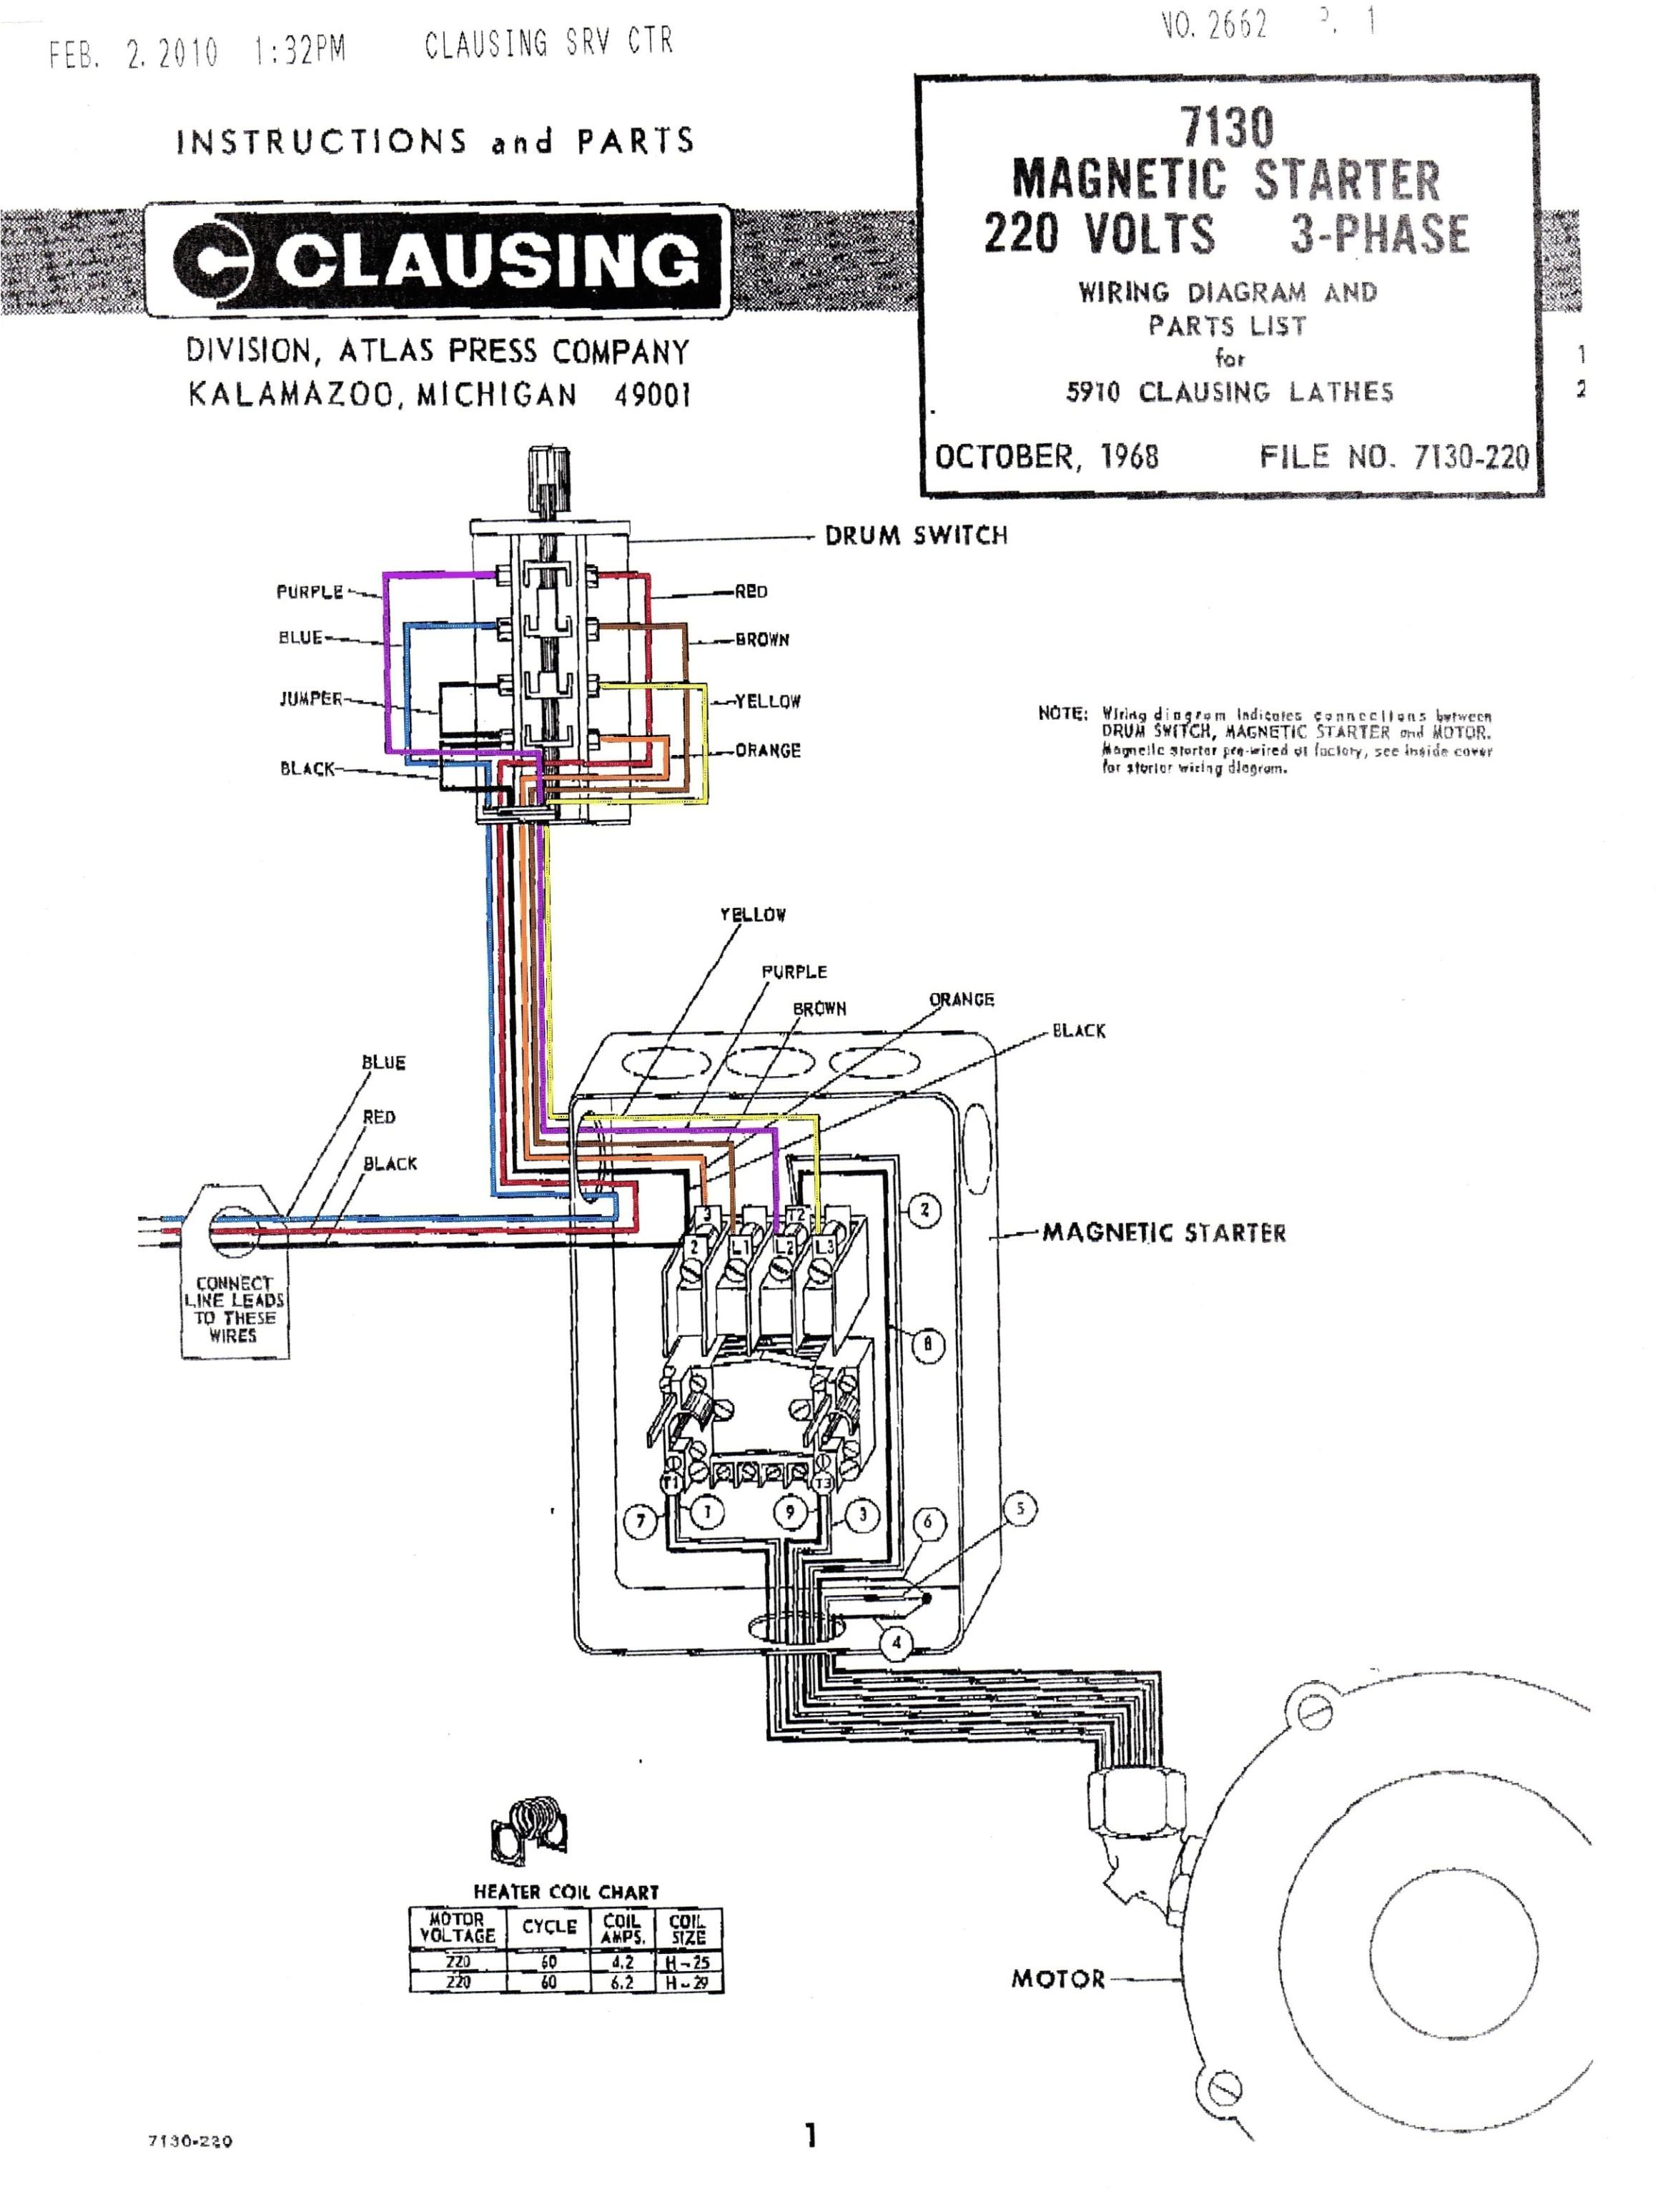 Wiring Diagram Of Contactor Cutler Hammer Contactor Wiring Diagram Wiring Diagram